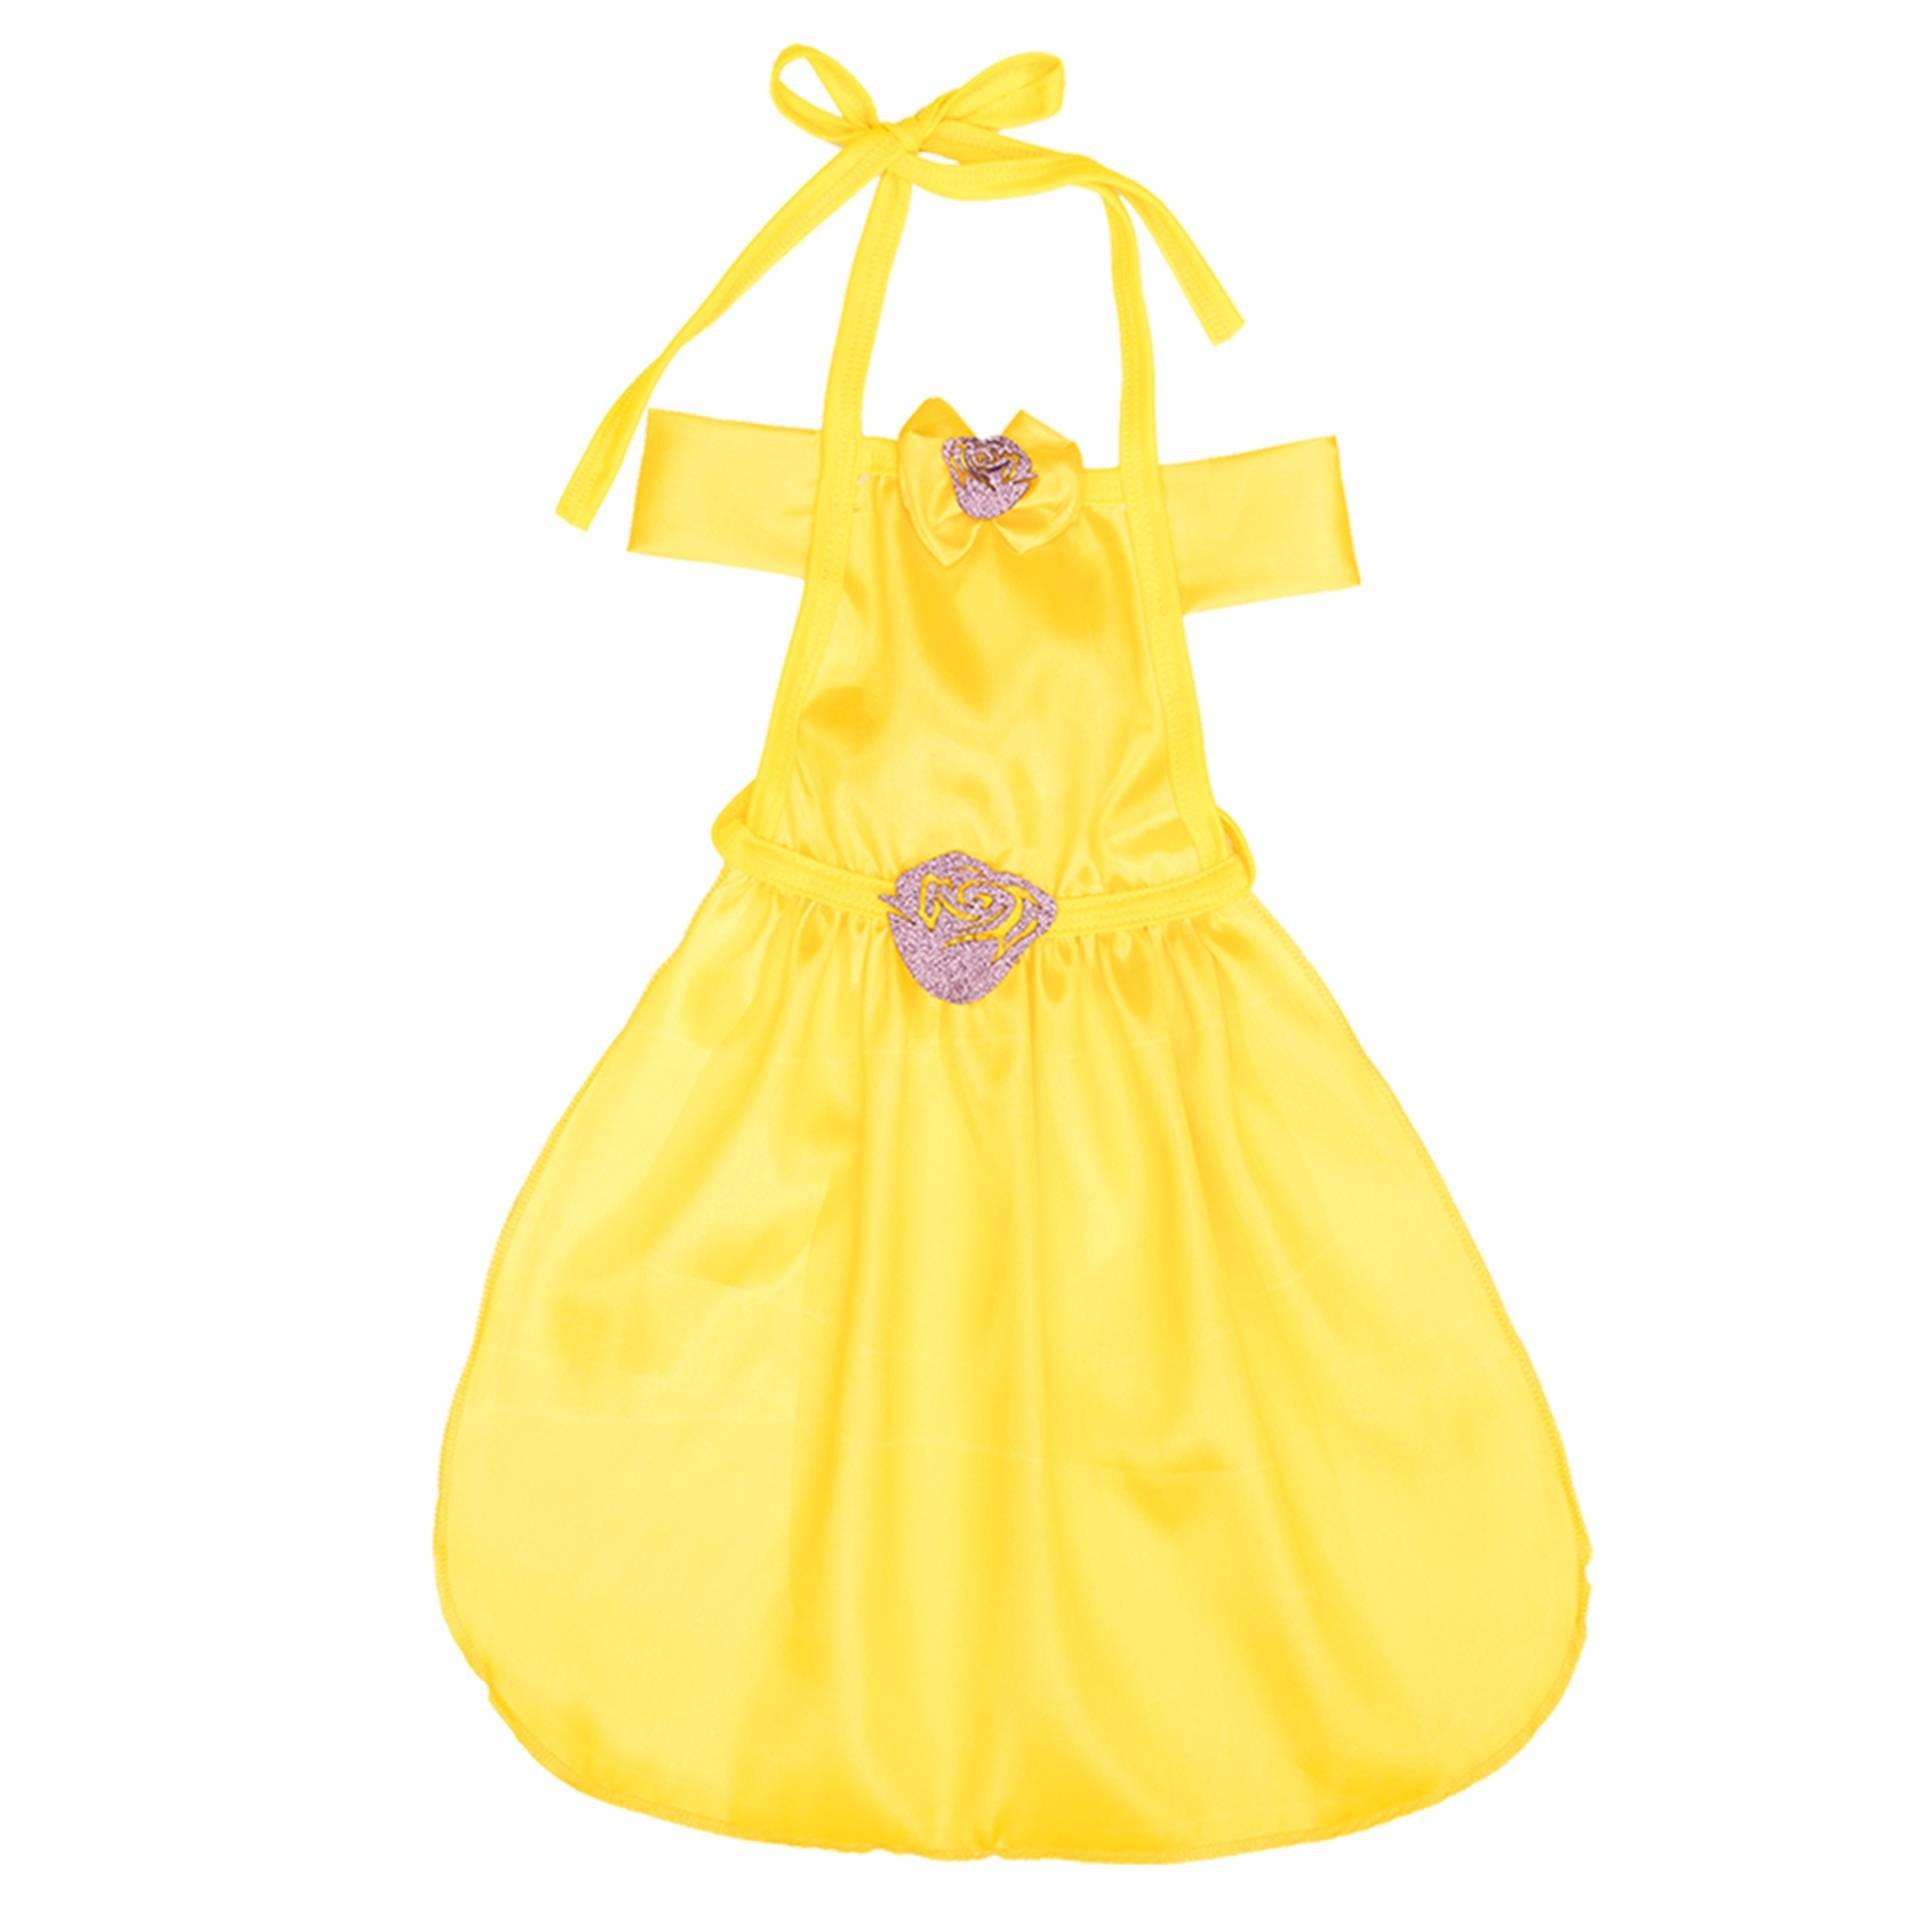 Fantasia de Princesa Arabella avental infantil